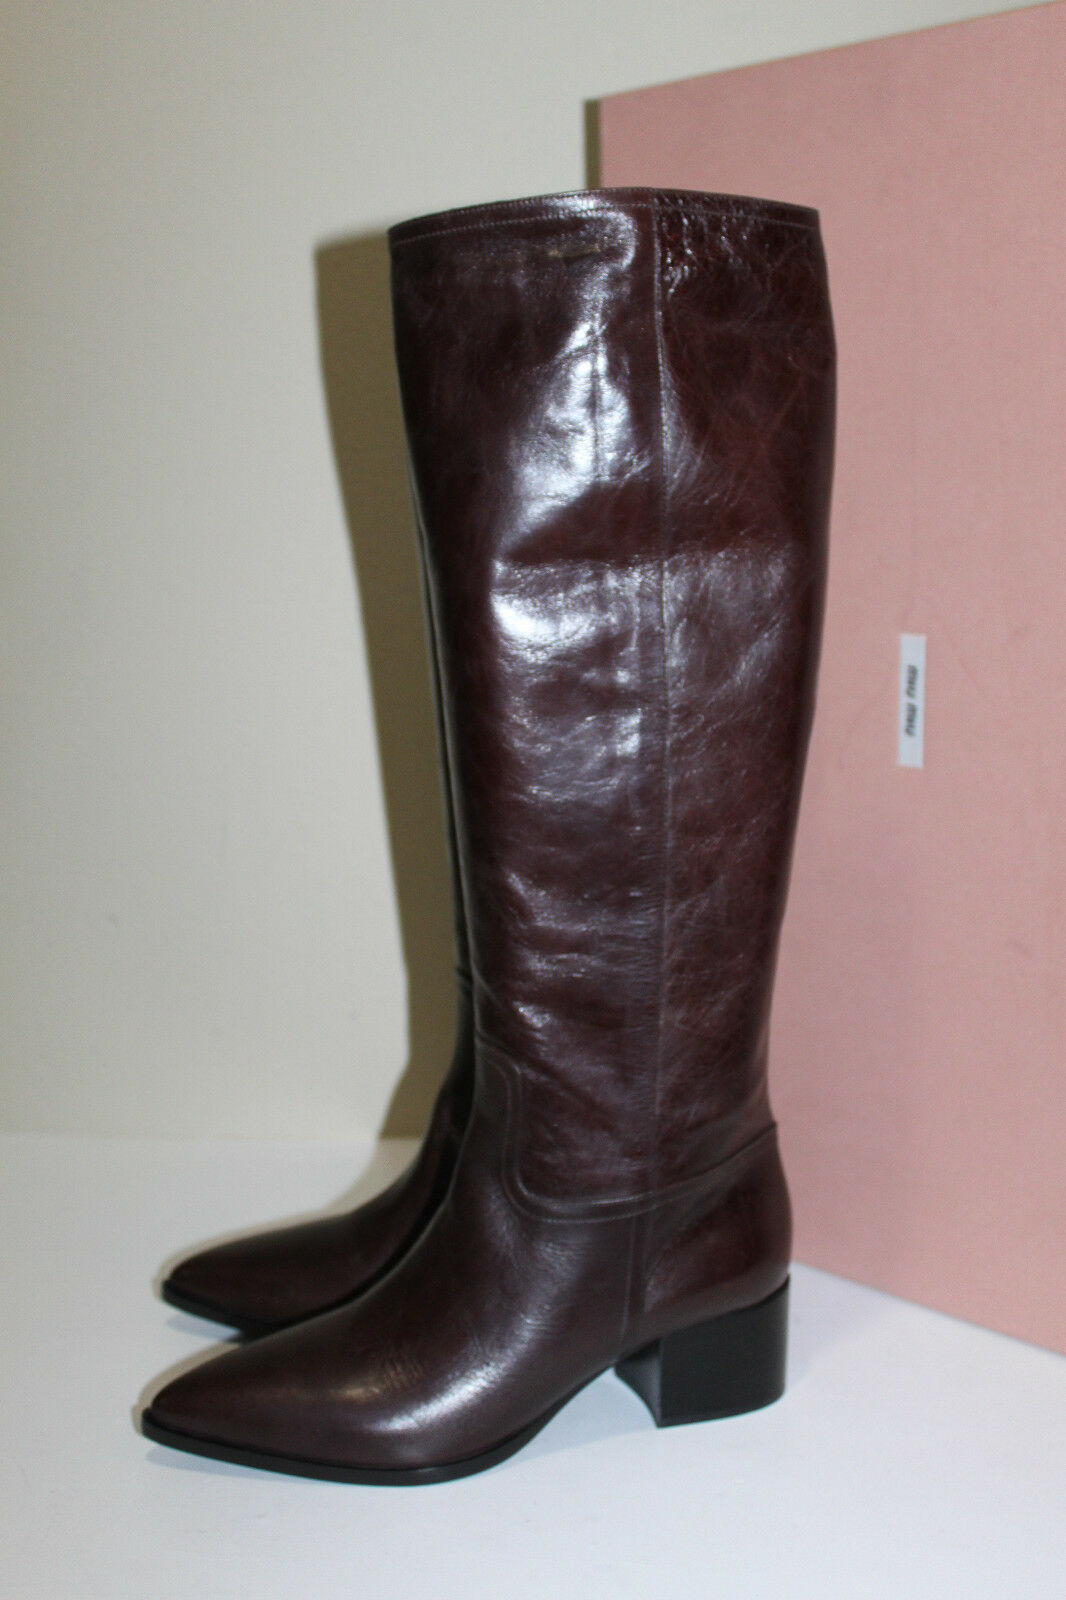 8.5 38.5 Miu Miu   Prada Pointed Toe braun Leather Knee High Flat Stiefel schuhe